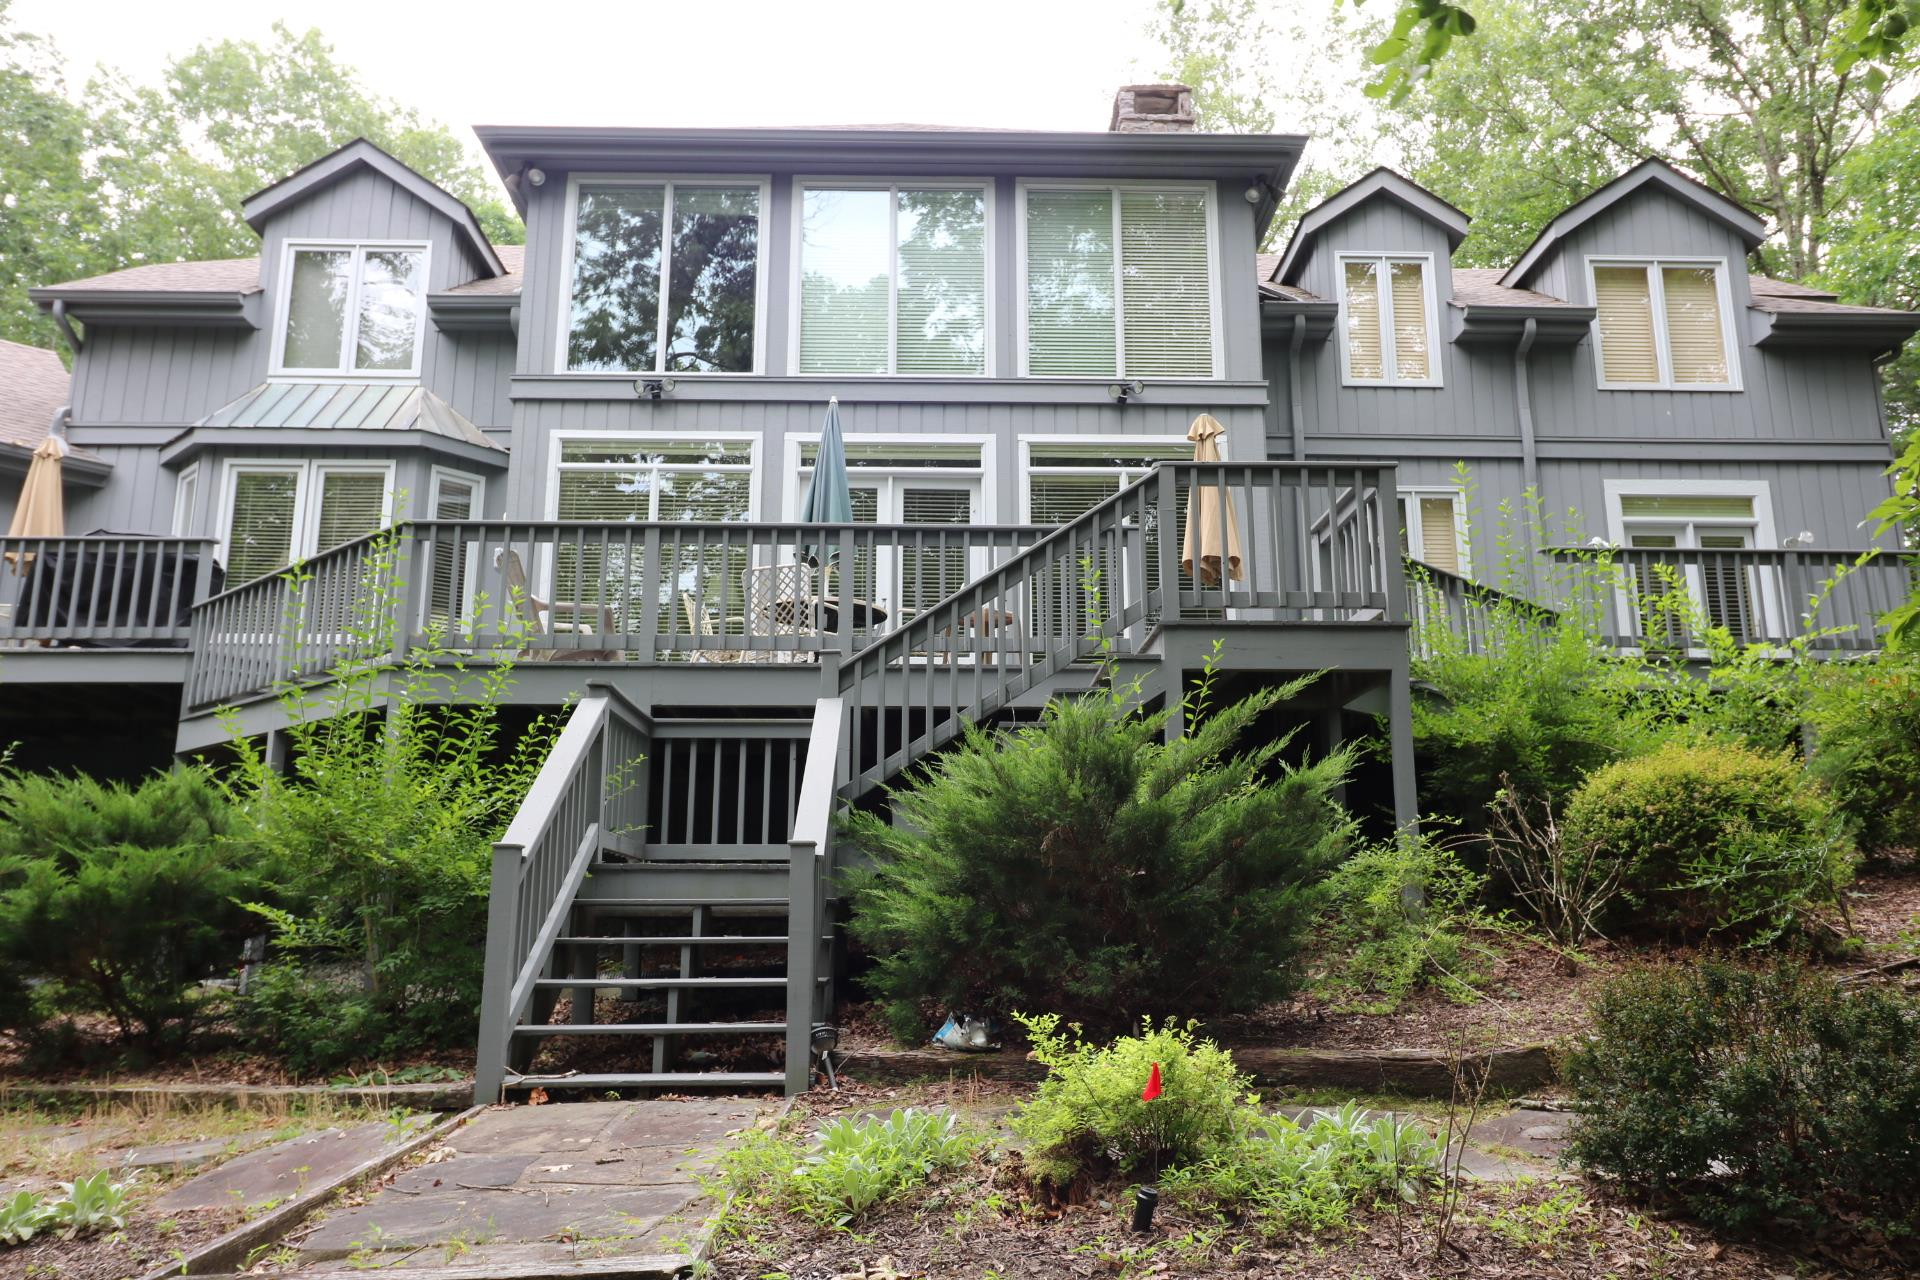 2411 Lakeshore Dr, Monteagle, TN 37356 - Monteagle, TN real estate listing